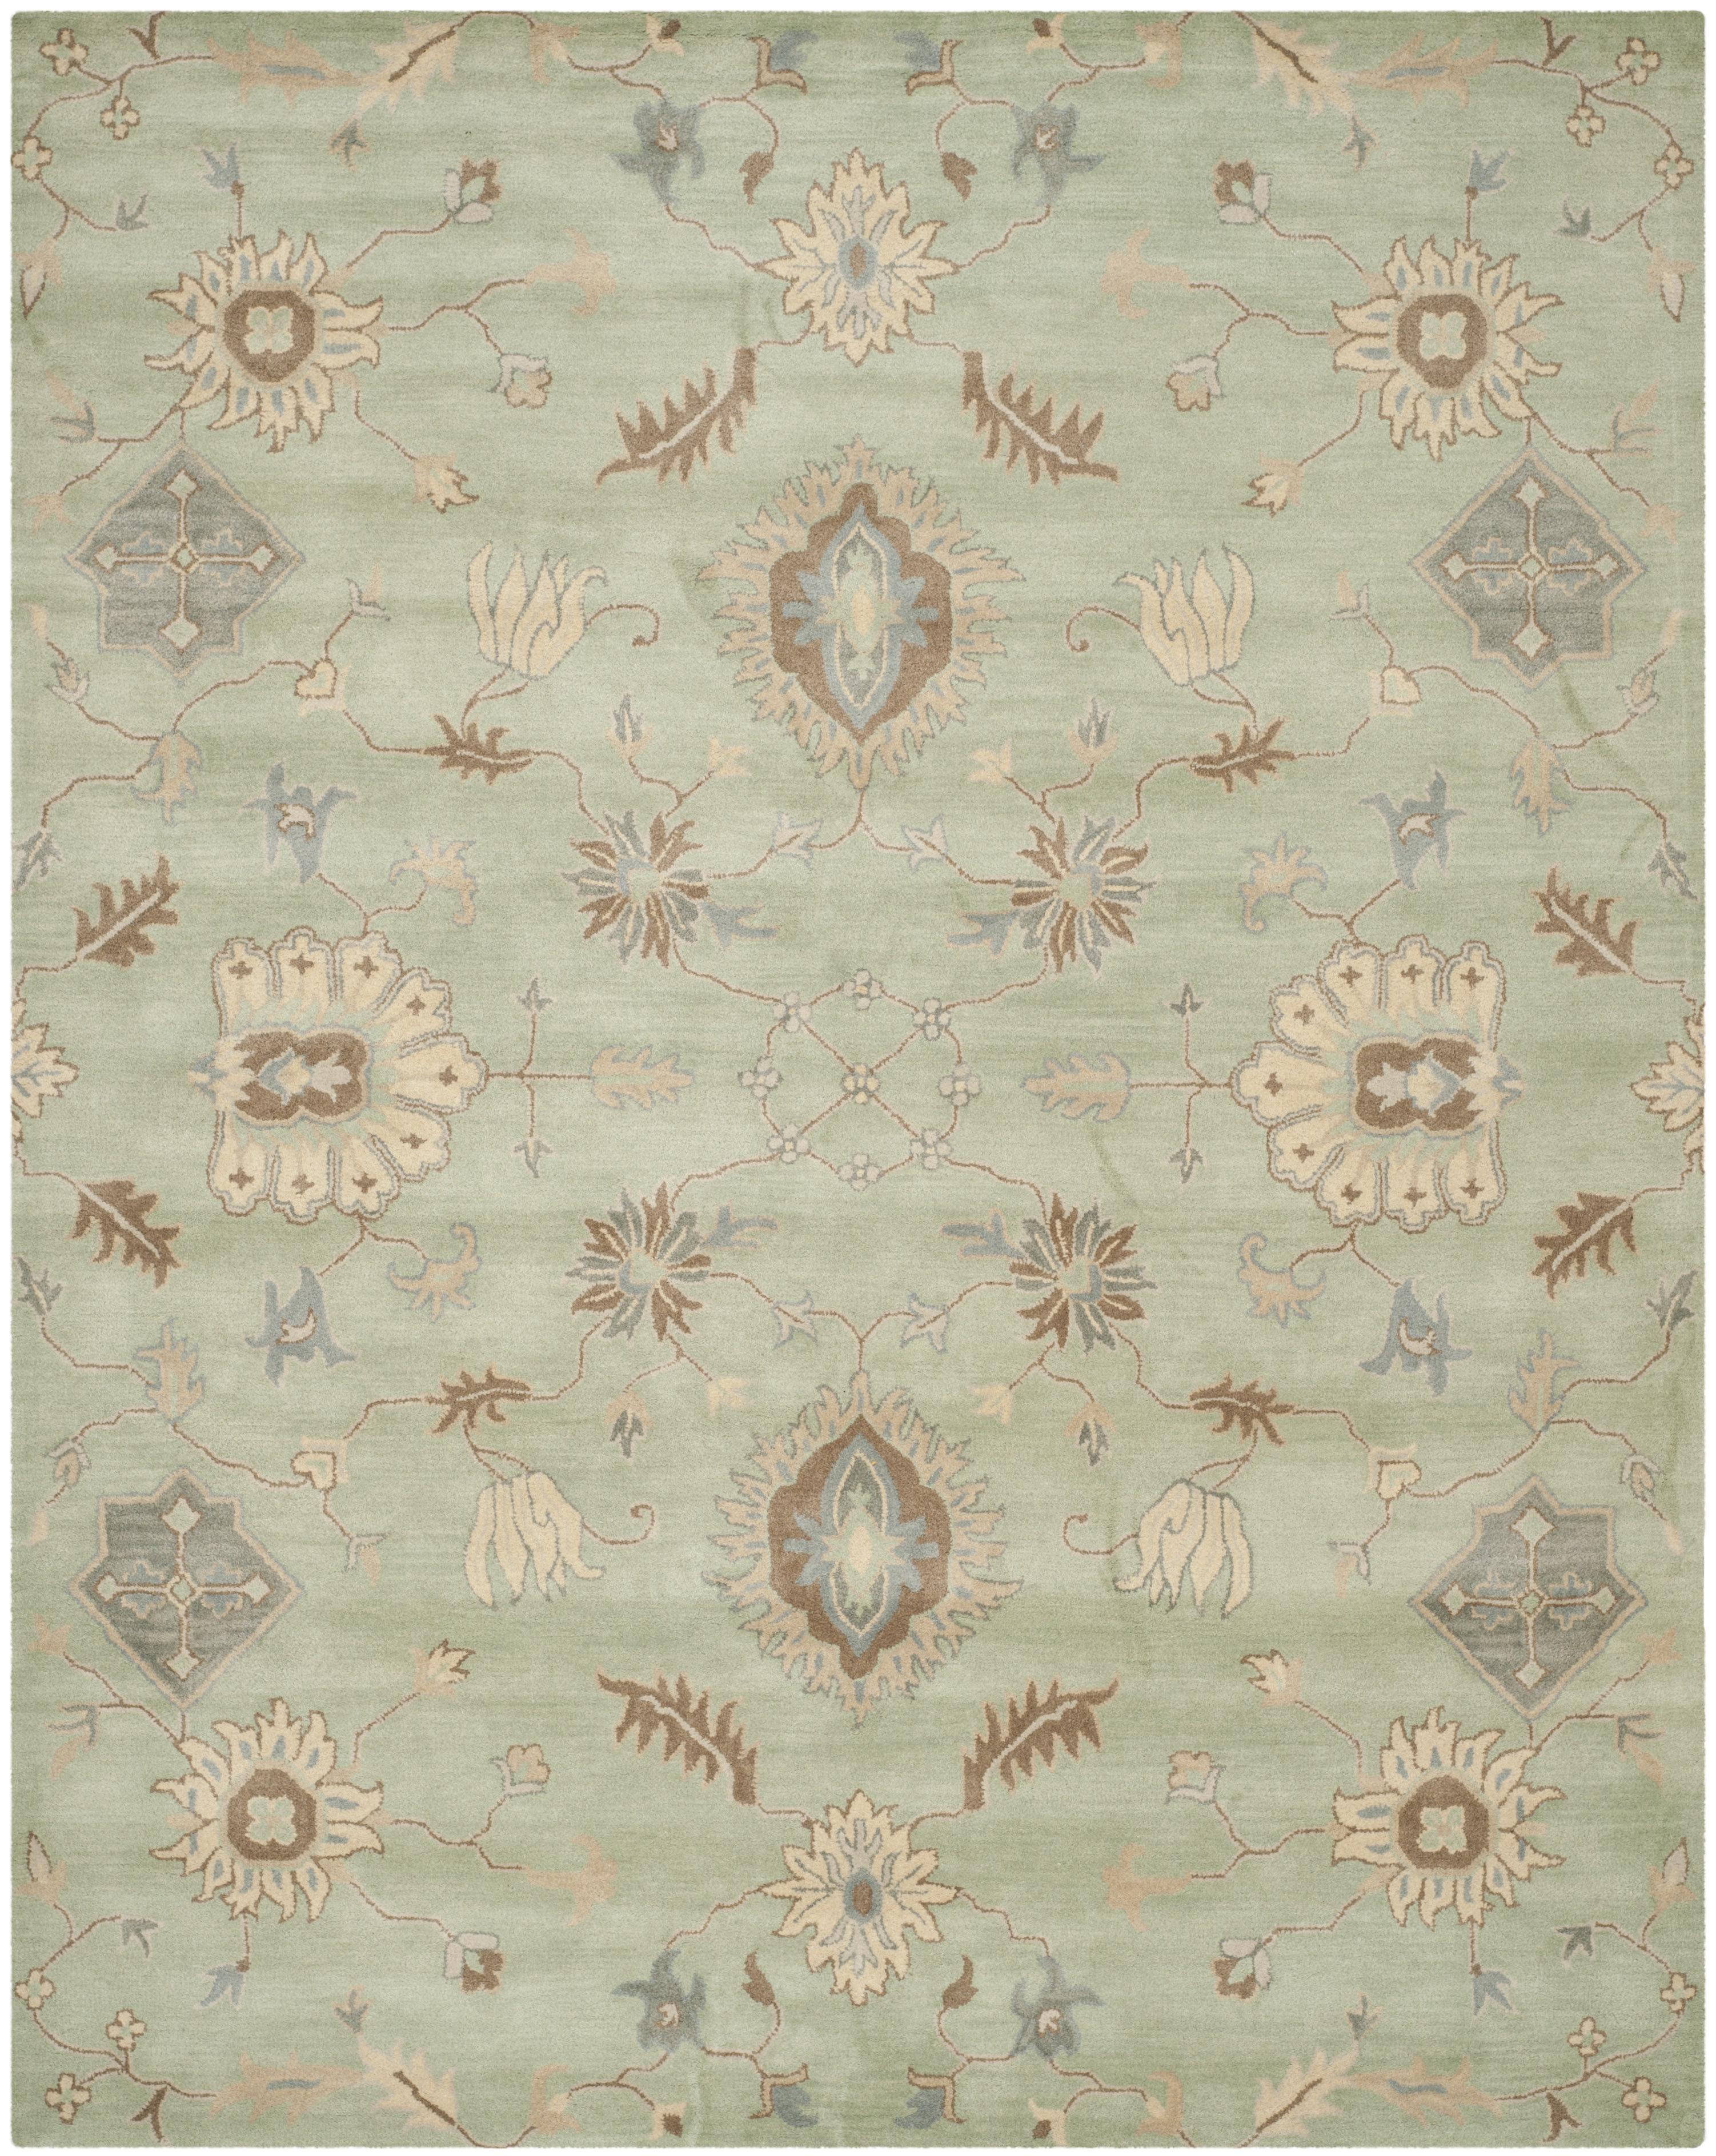 Safavieh Wyndham Floral Handmade Tufted Wool Light Green Cobalt Blue Brown Area Rug Perigold